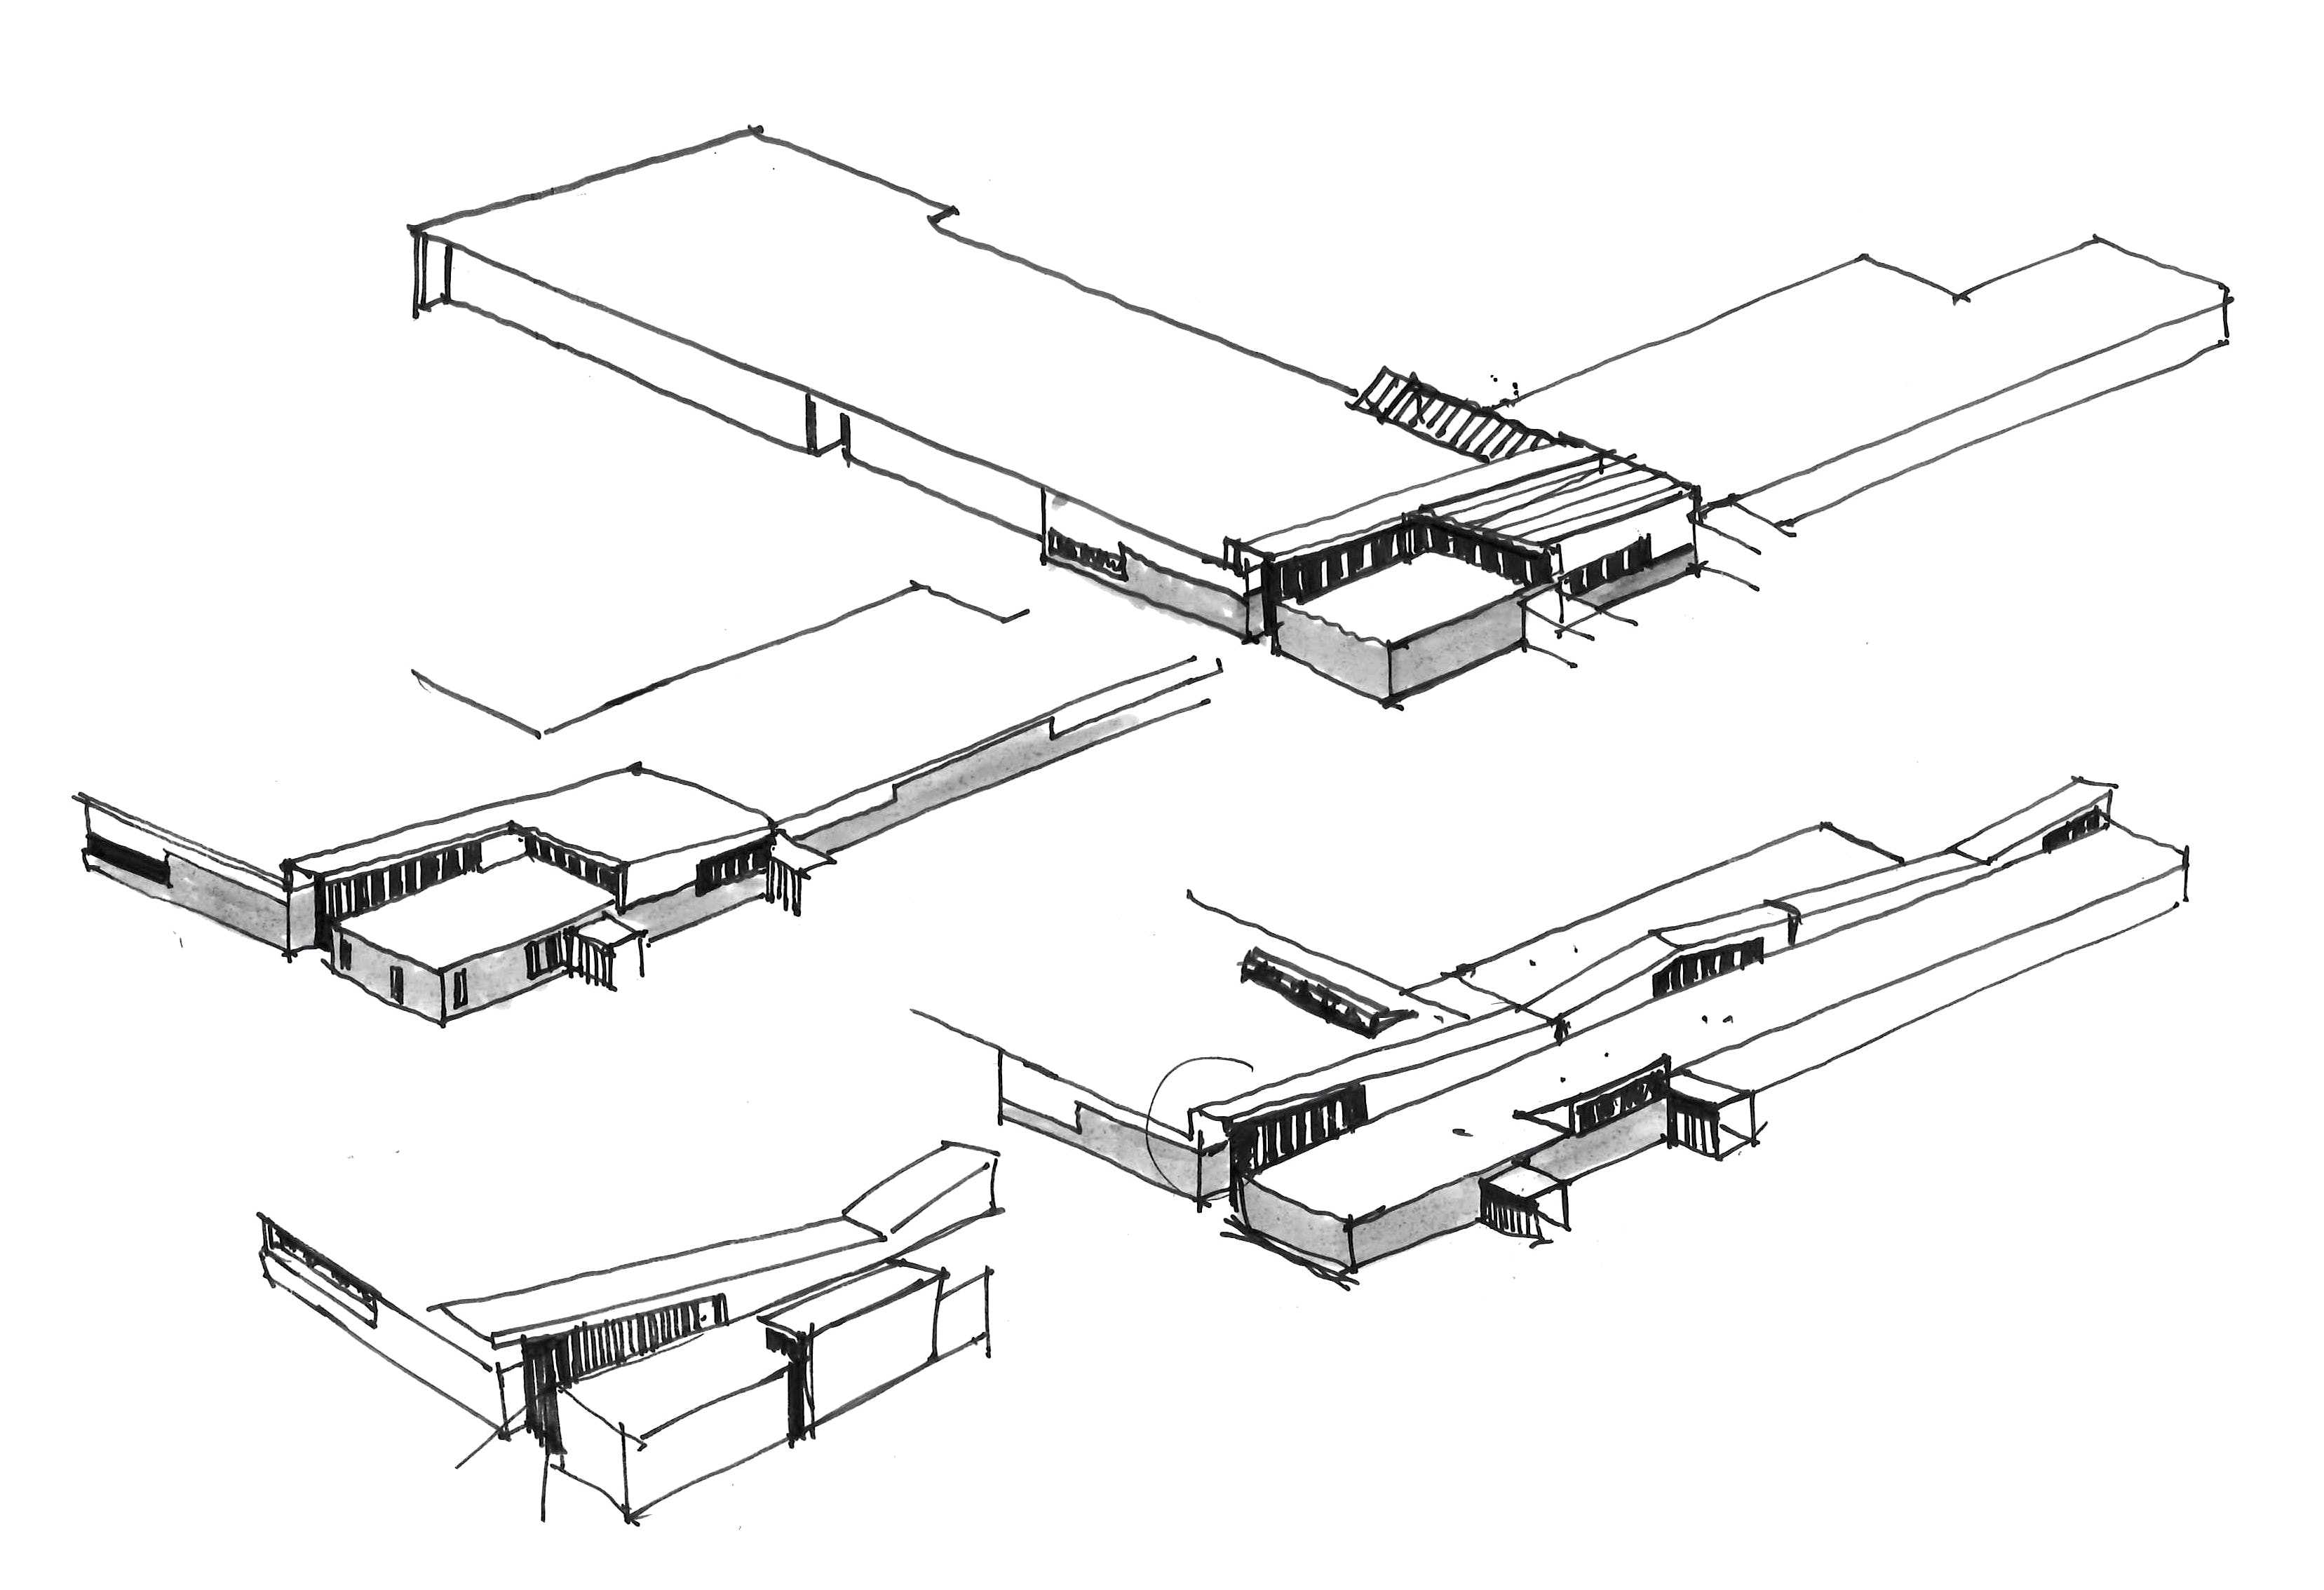 13 48 flippin sketch 2013 12 10 02